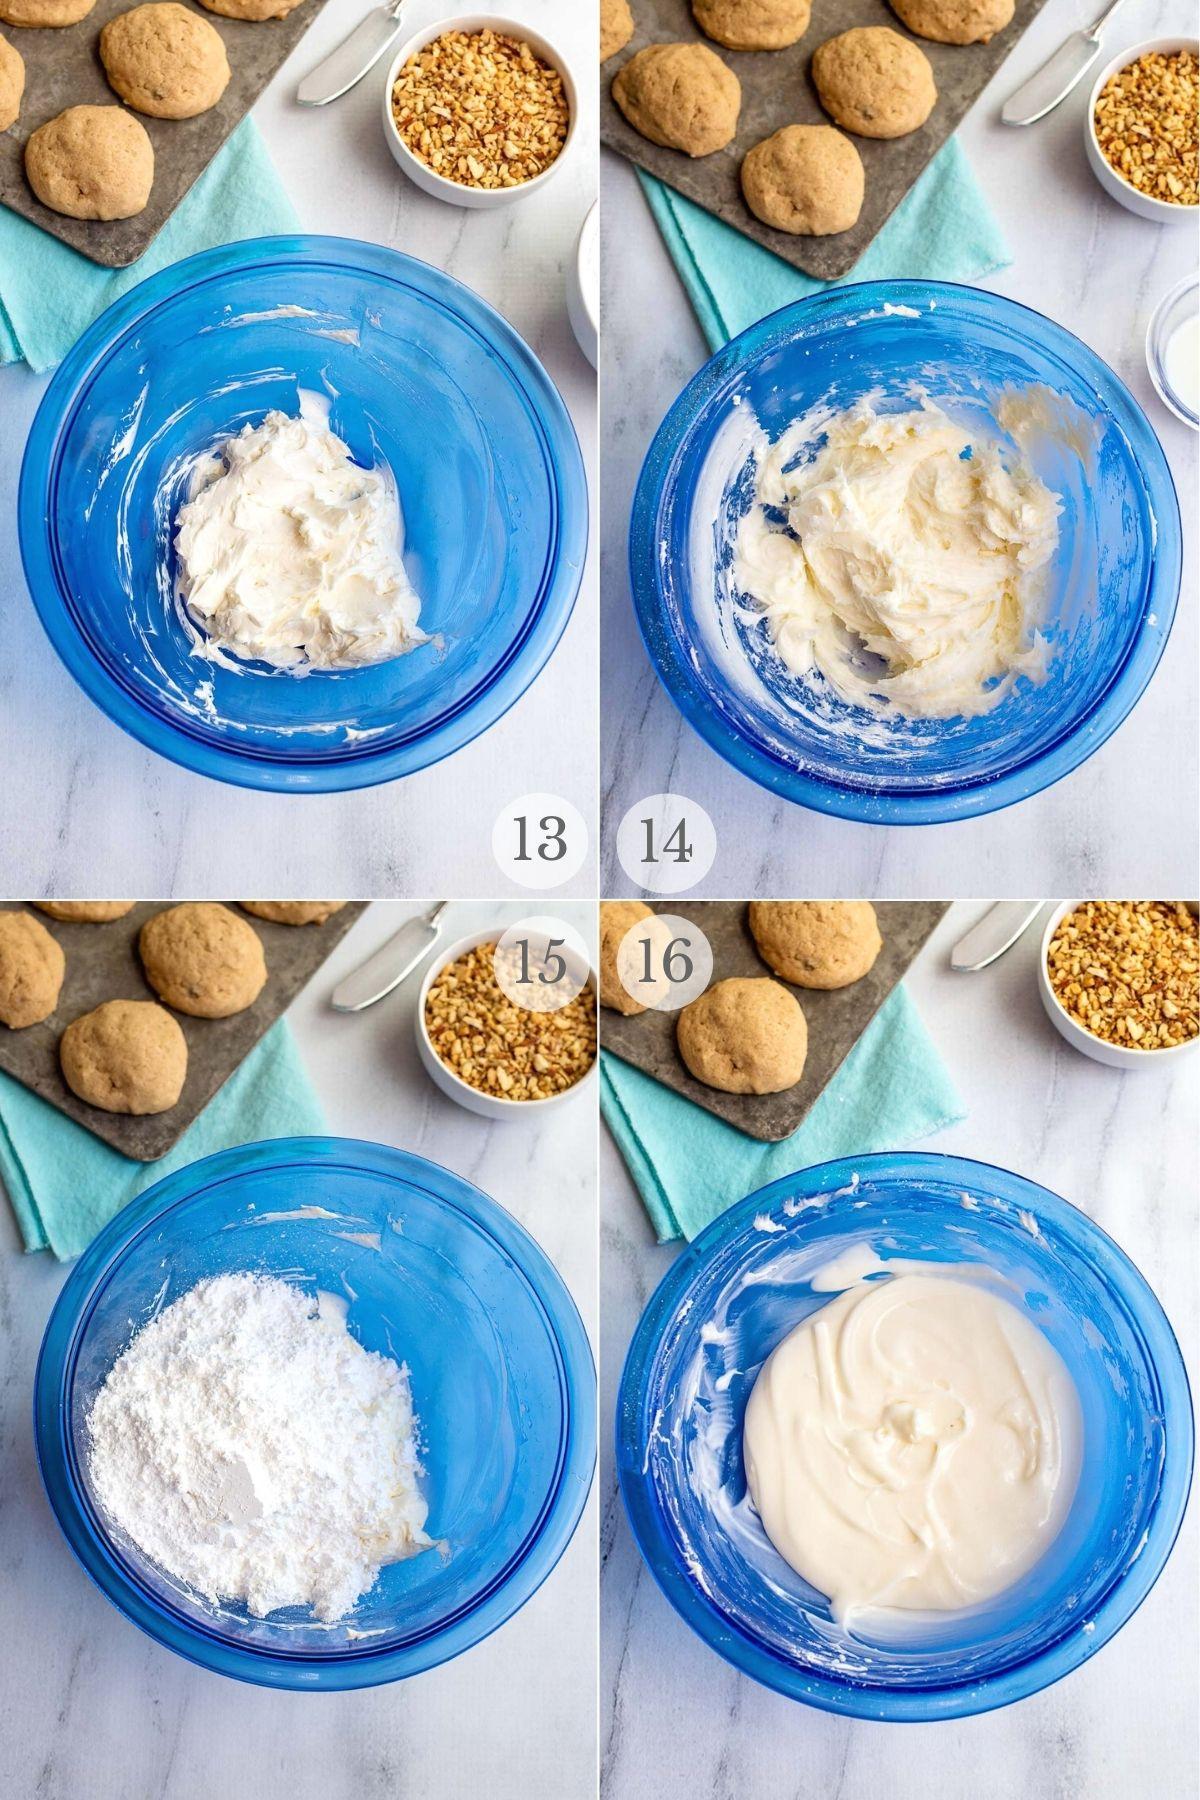 Banana Bread Cookies recipes steps 13-16